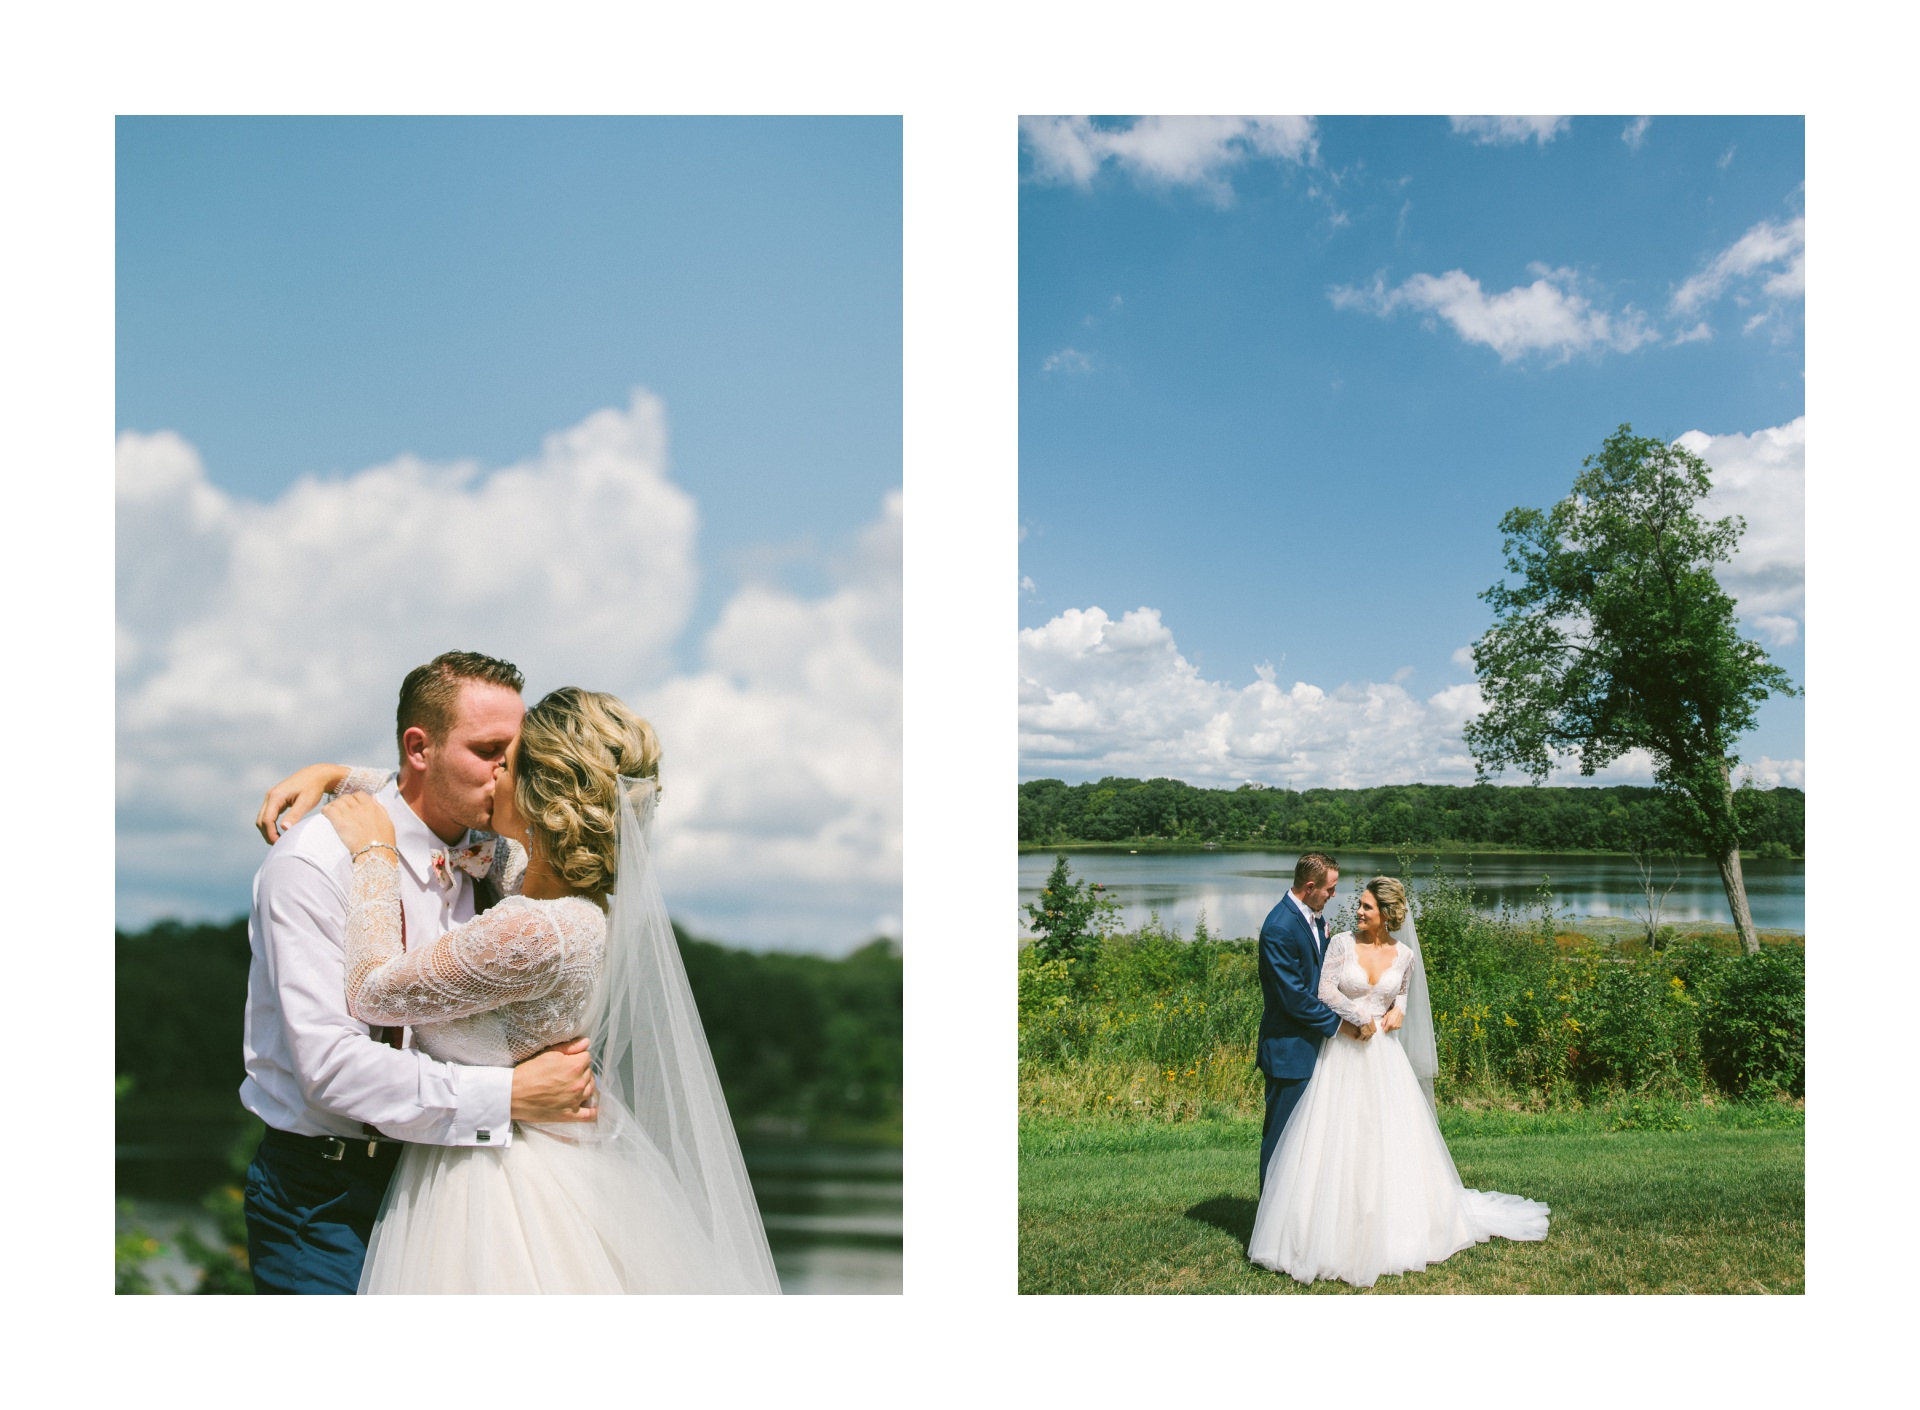 Meadow Ridge Farm Wedding Photos in Windsor 1 27.jpg